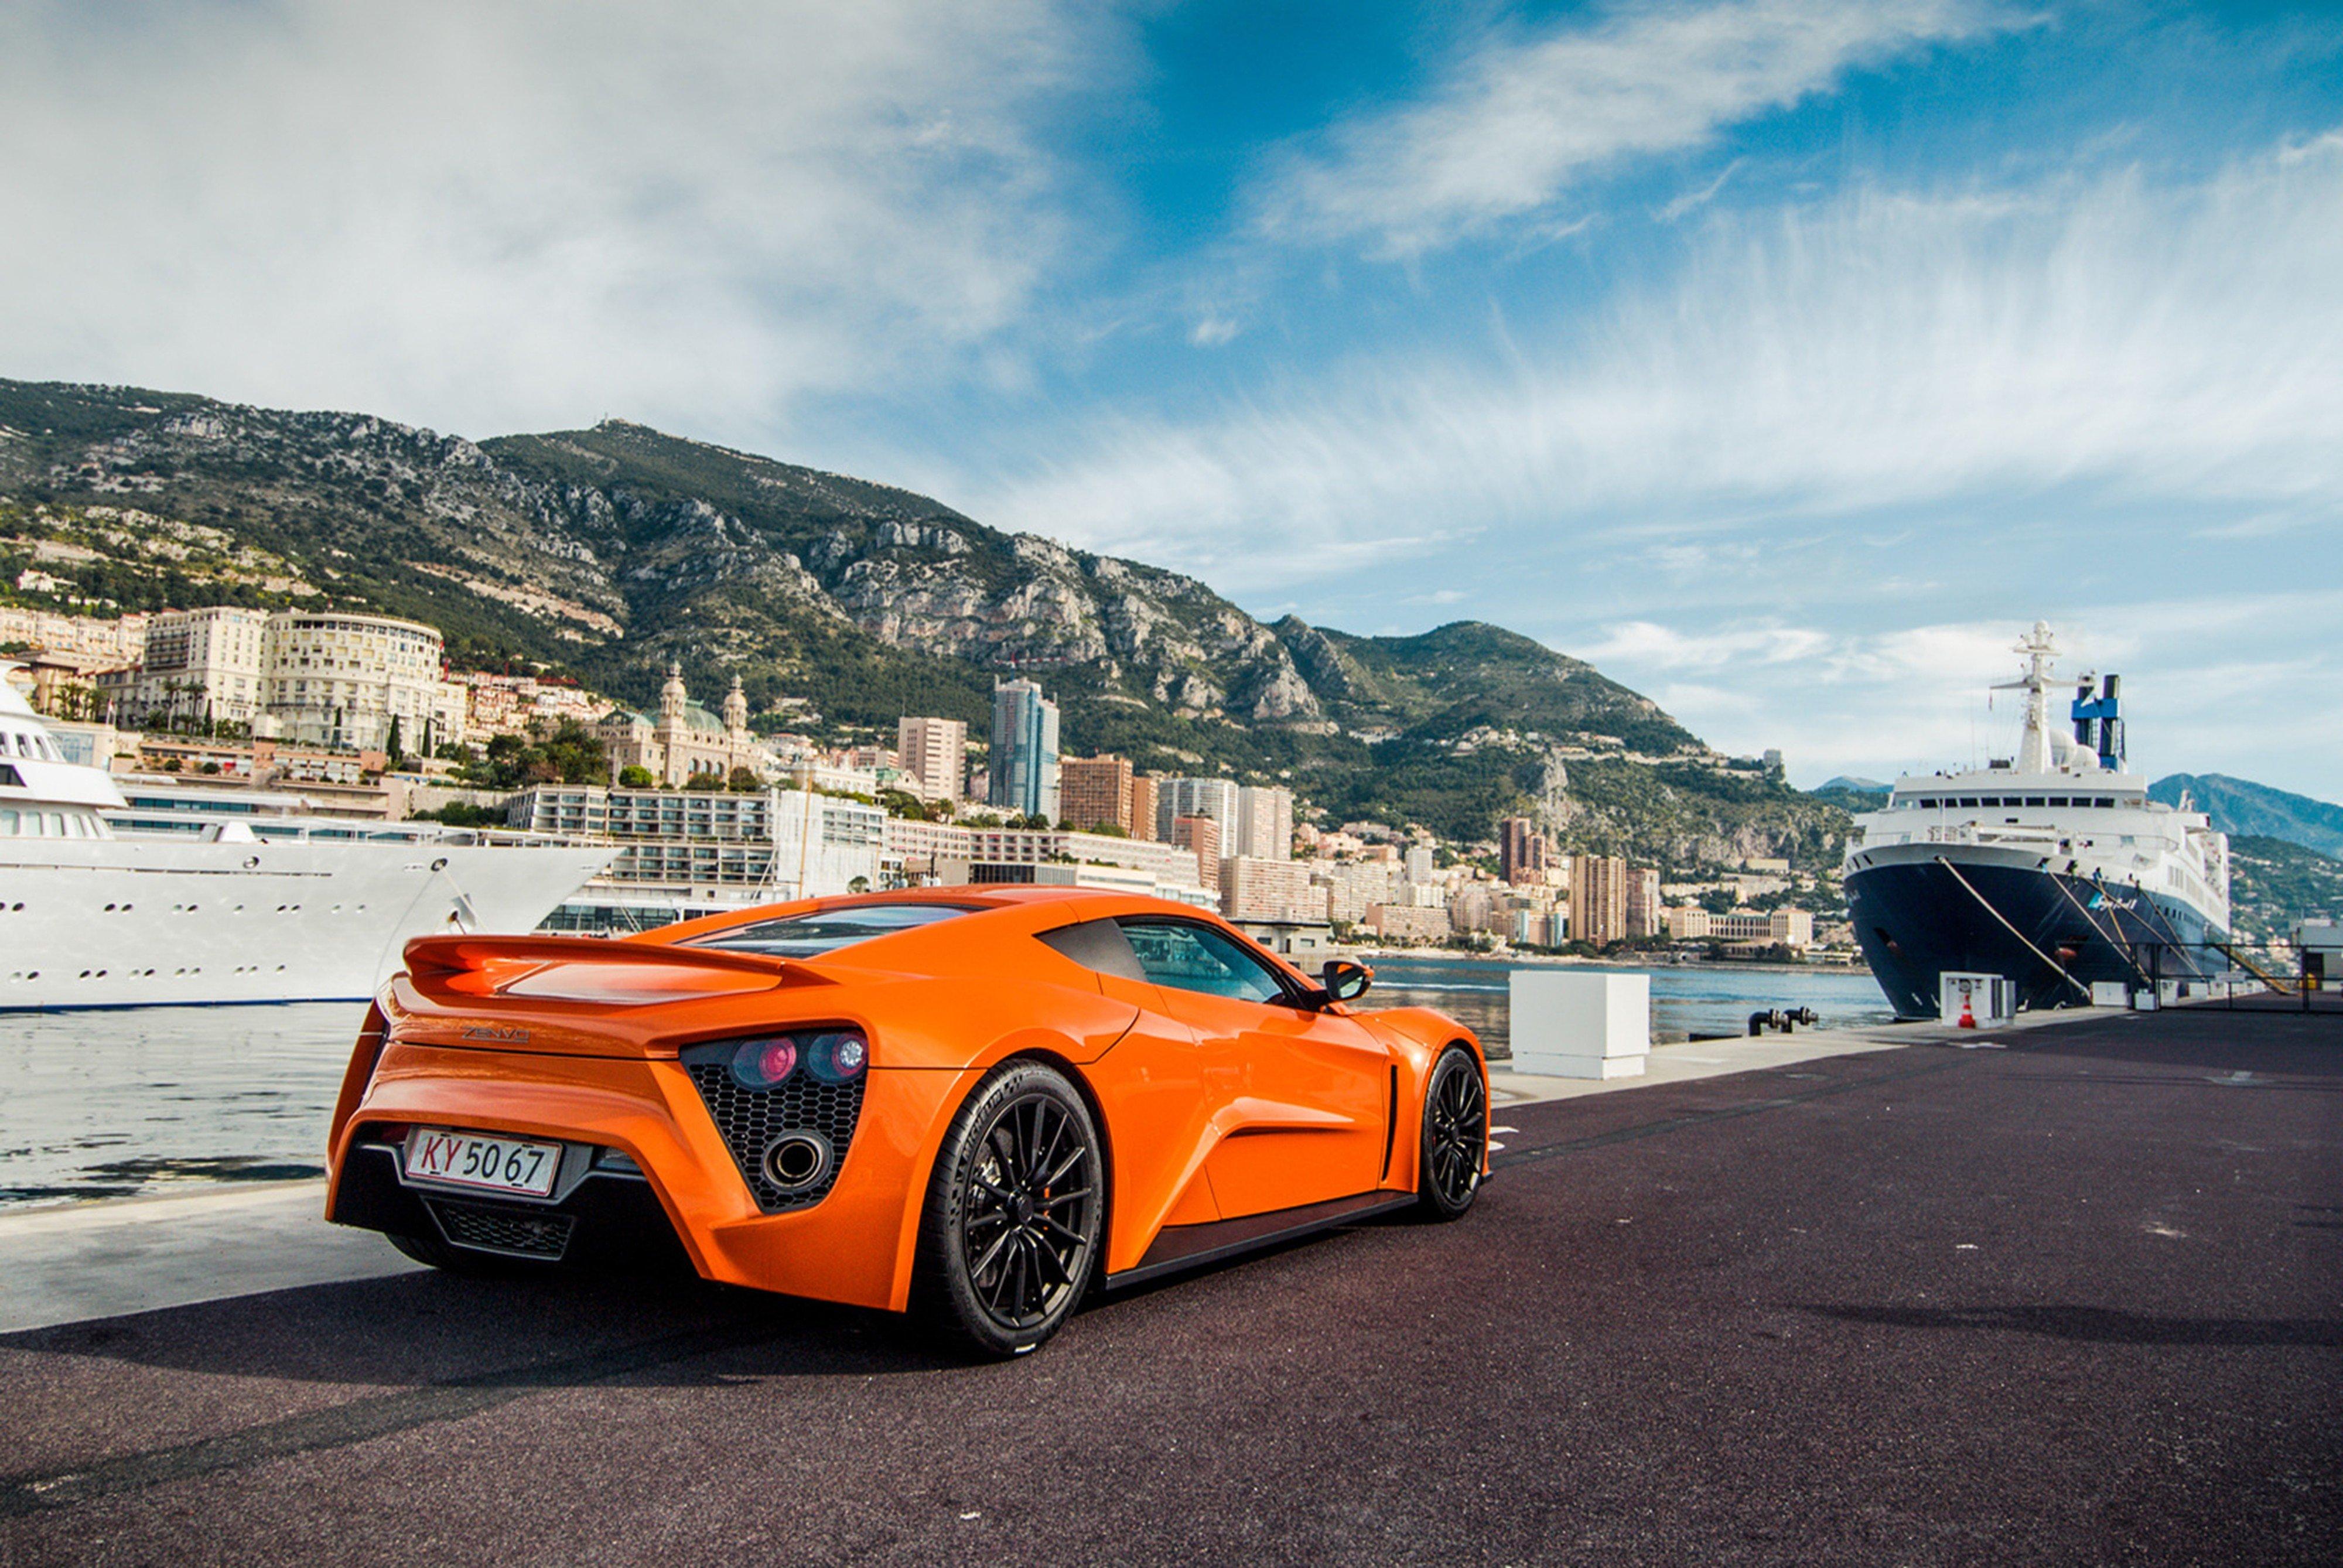 2009 Zenvo St1 Tours Monaco Supercar Car Sports Orange City Europe Wallpaper 4000x2677 349082 Wallpaperup